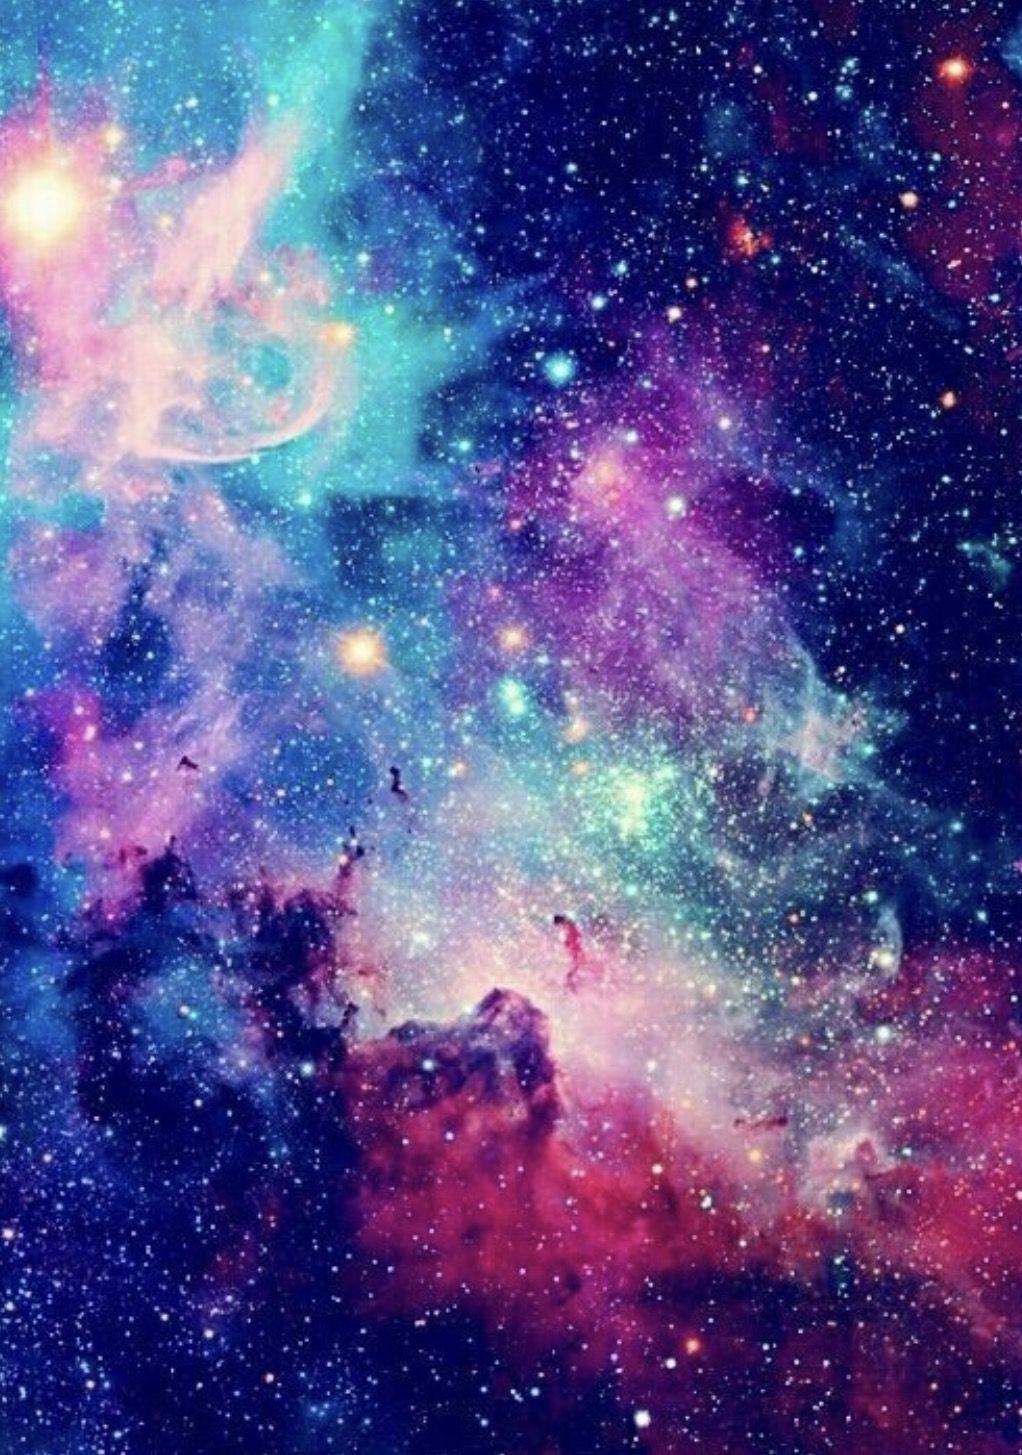 Astronomy Wallpaper Hd Pin By Asmaa Ahmad On Galaxy Galaxy Background Galaxy